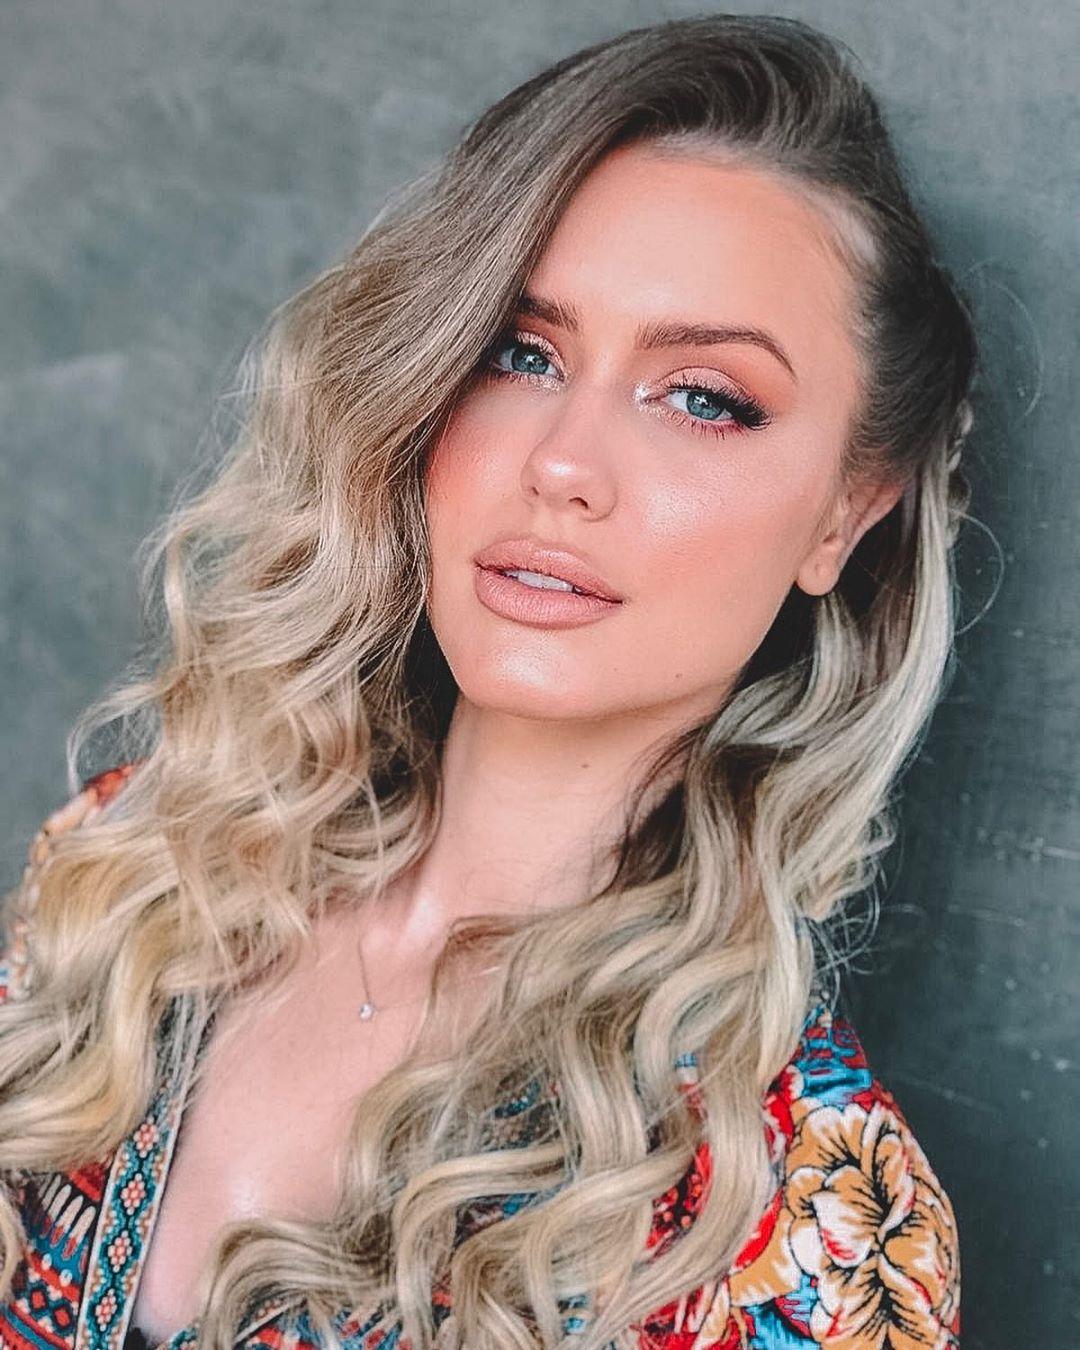 marcella kozinski de barros, 3rd runner-up de miss tourism world 2019. 66823310